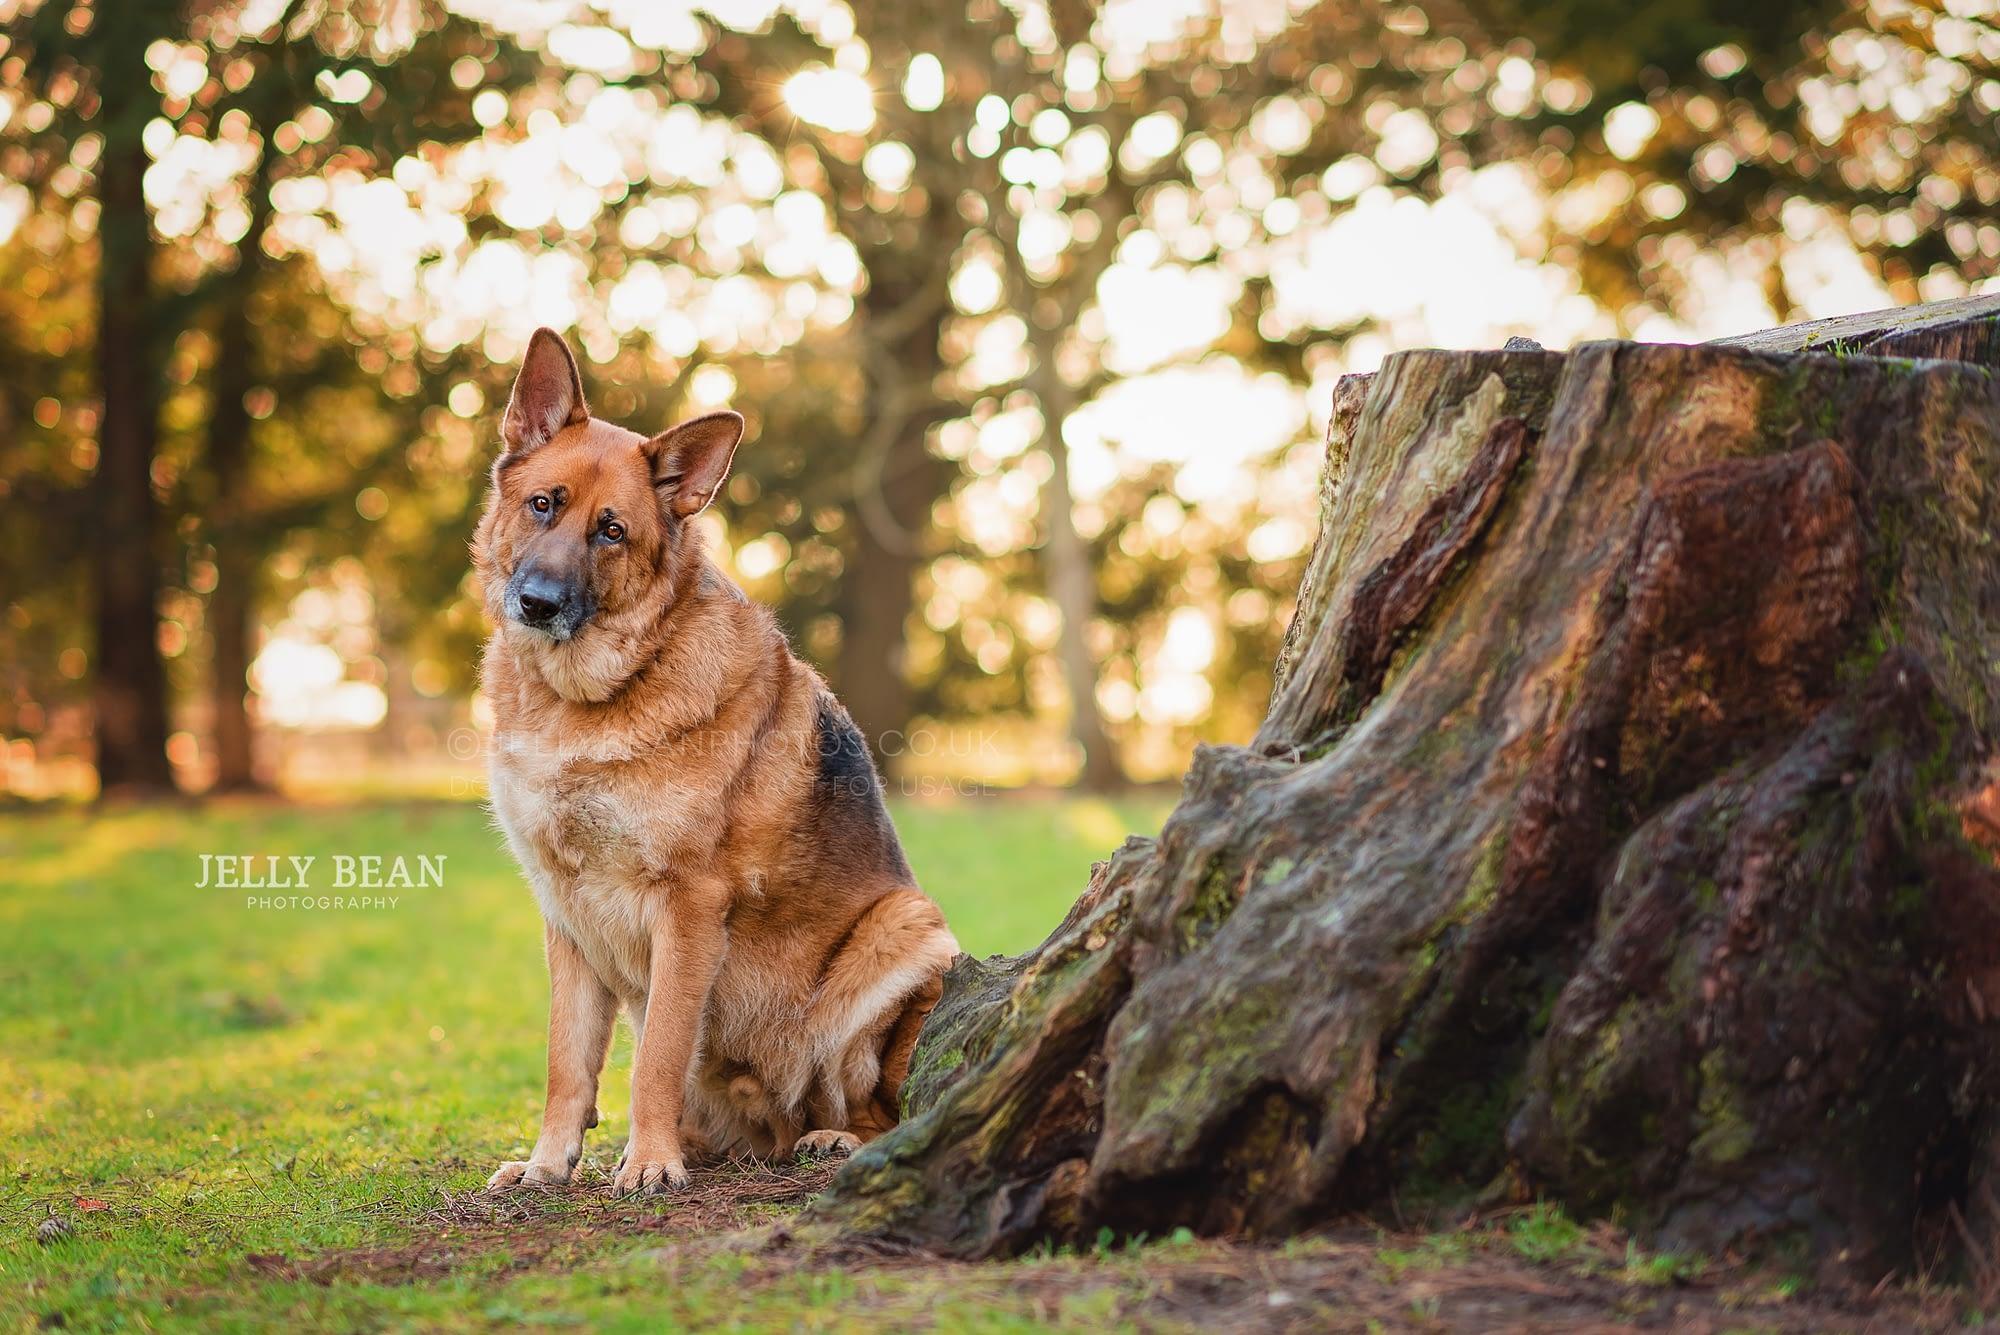 German shepherd sitting by tree trunk